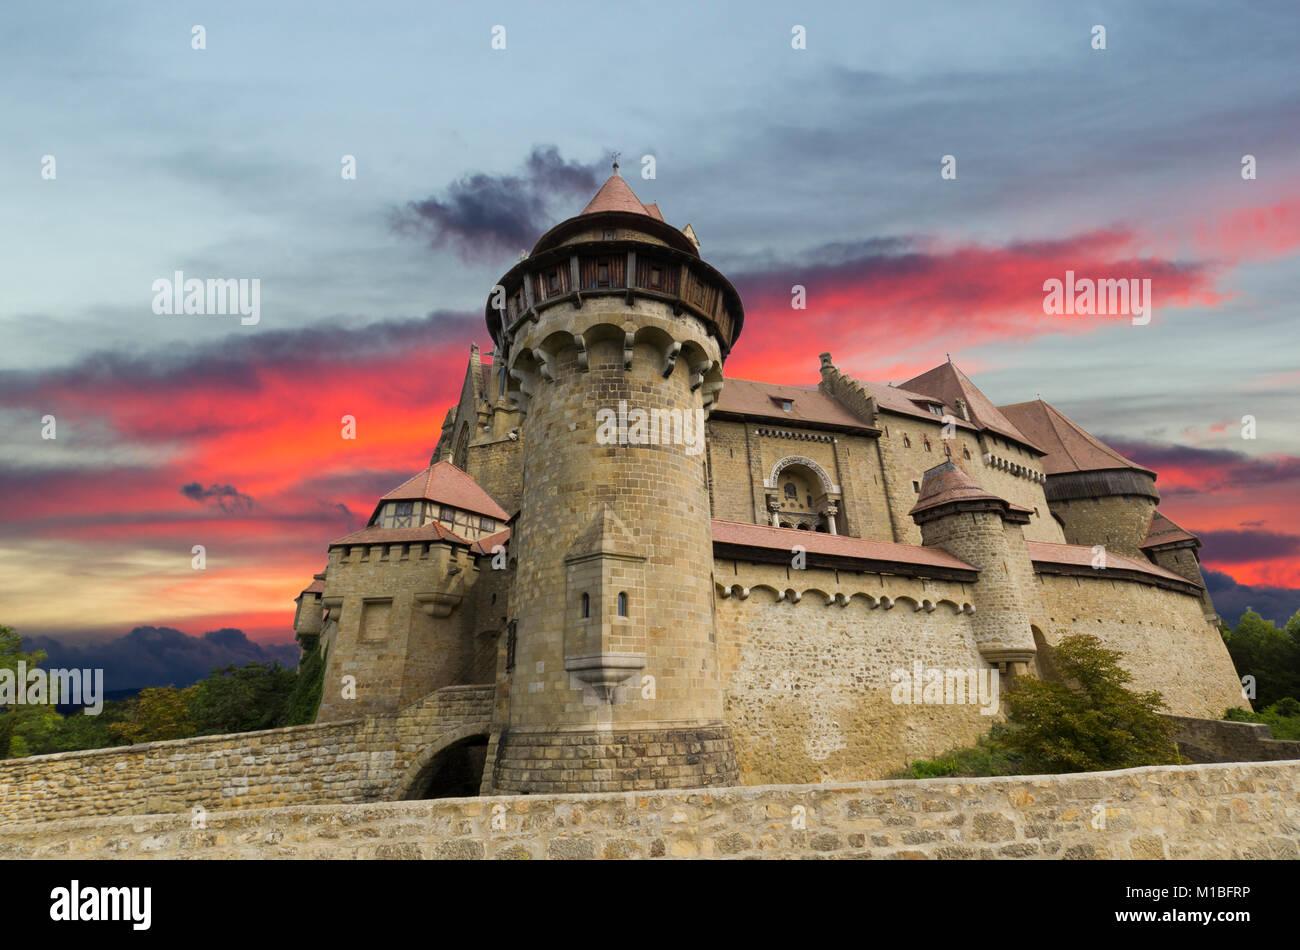 Kreuzenstein Castle from Austria, beautiful view sky - Stock Image